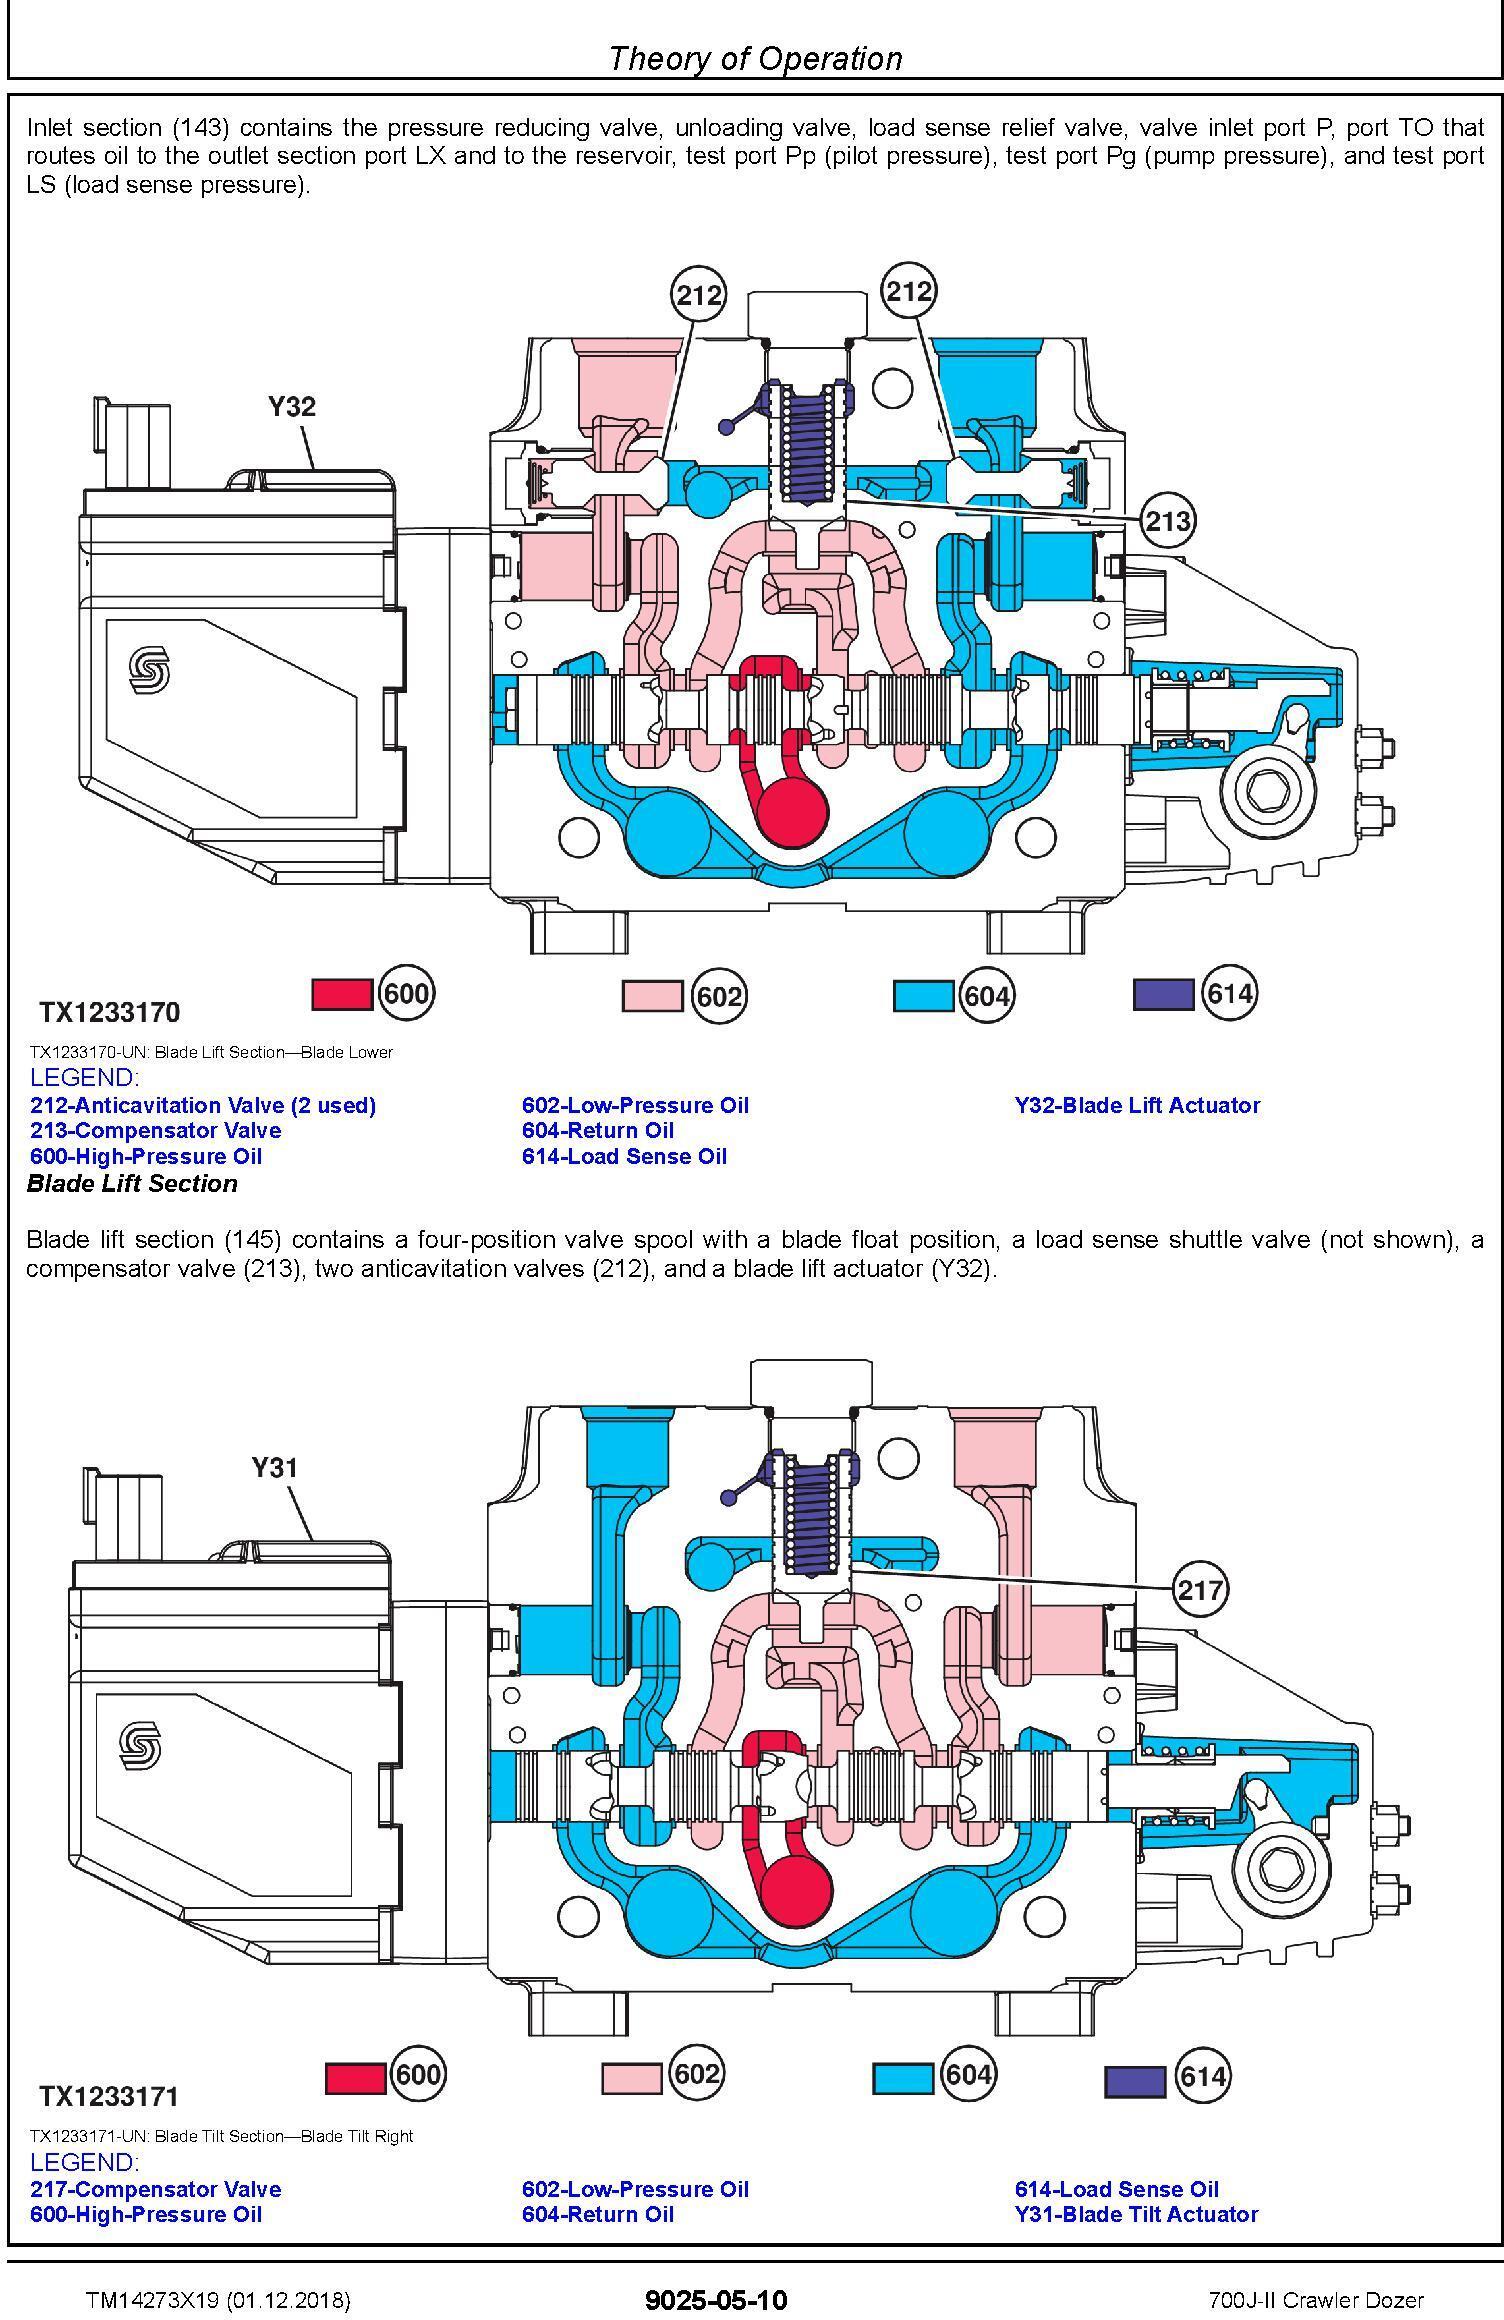 John Deere 700J-II (SN. D000001-) Crawler Dozer Operation & Test Technical Manual (TM14273X19) - 2